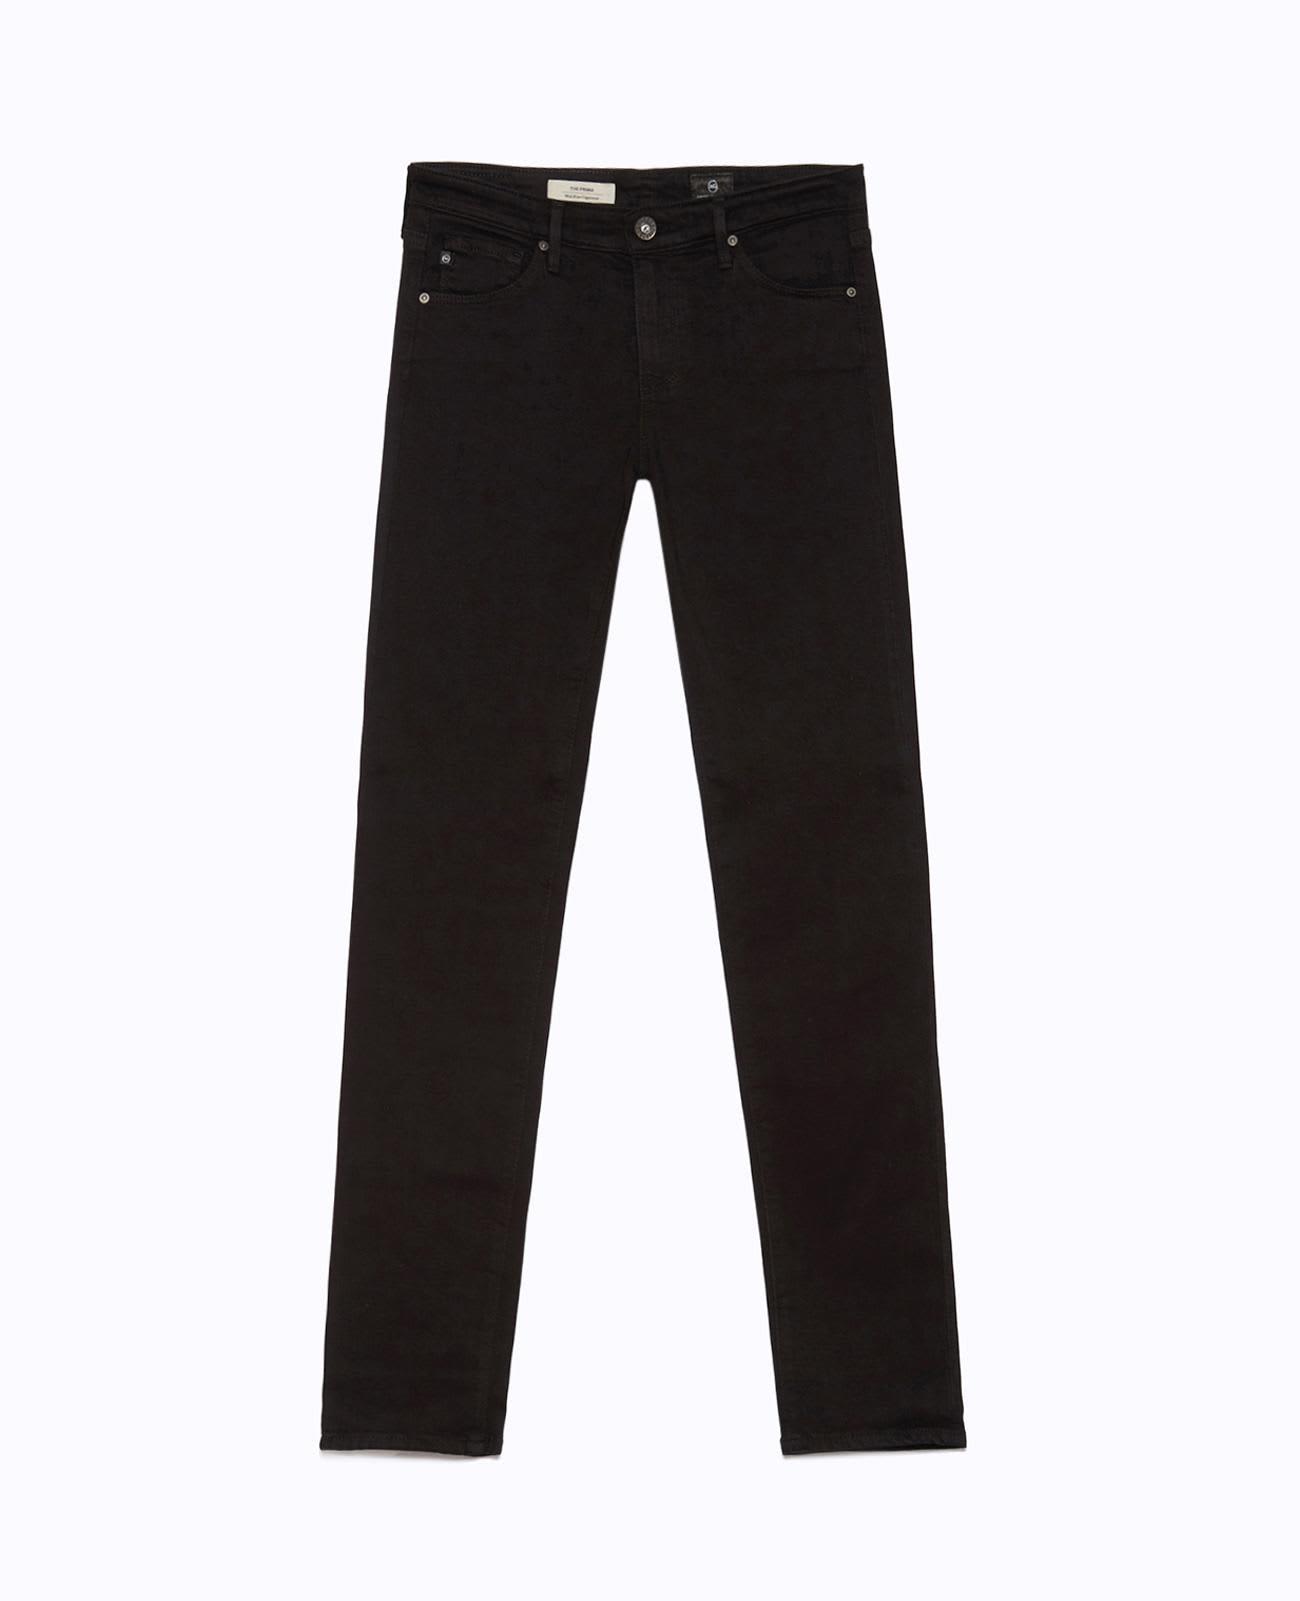 AG Jeans Prima Cigarette Jeans Super Black